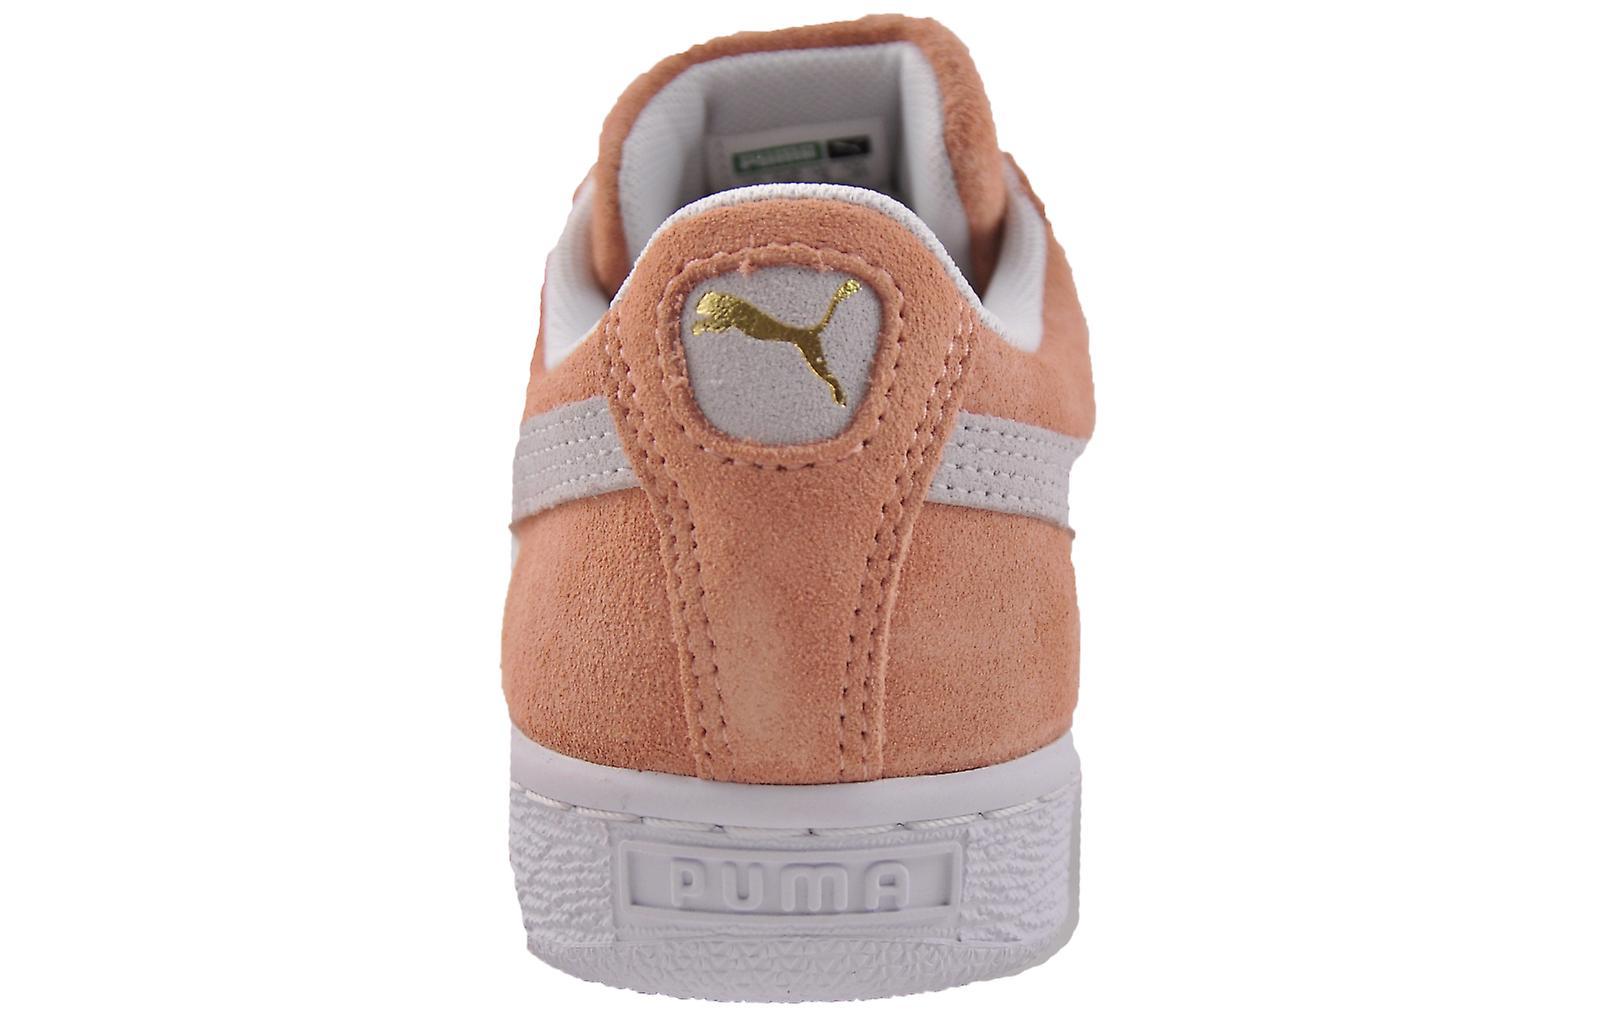 Puma Suede Classic Soft Pink / White